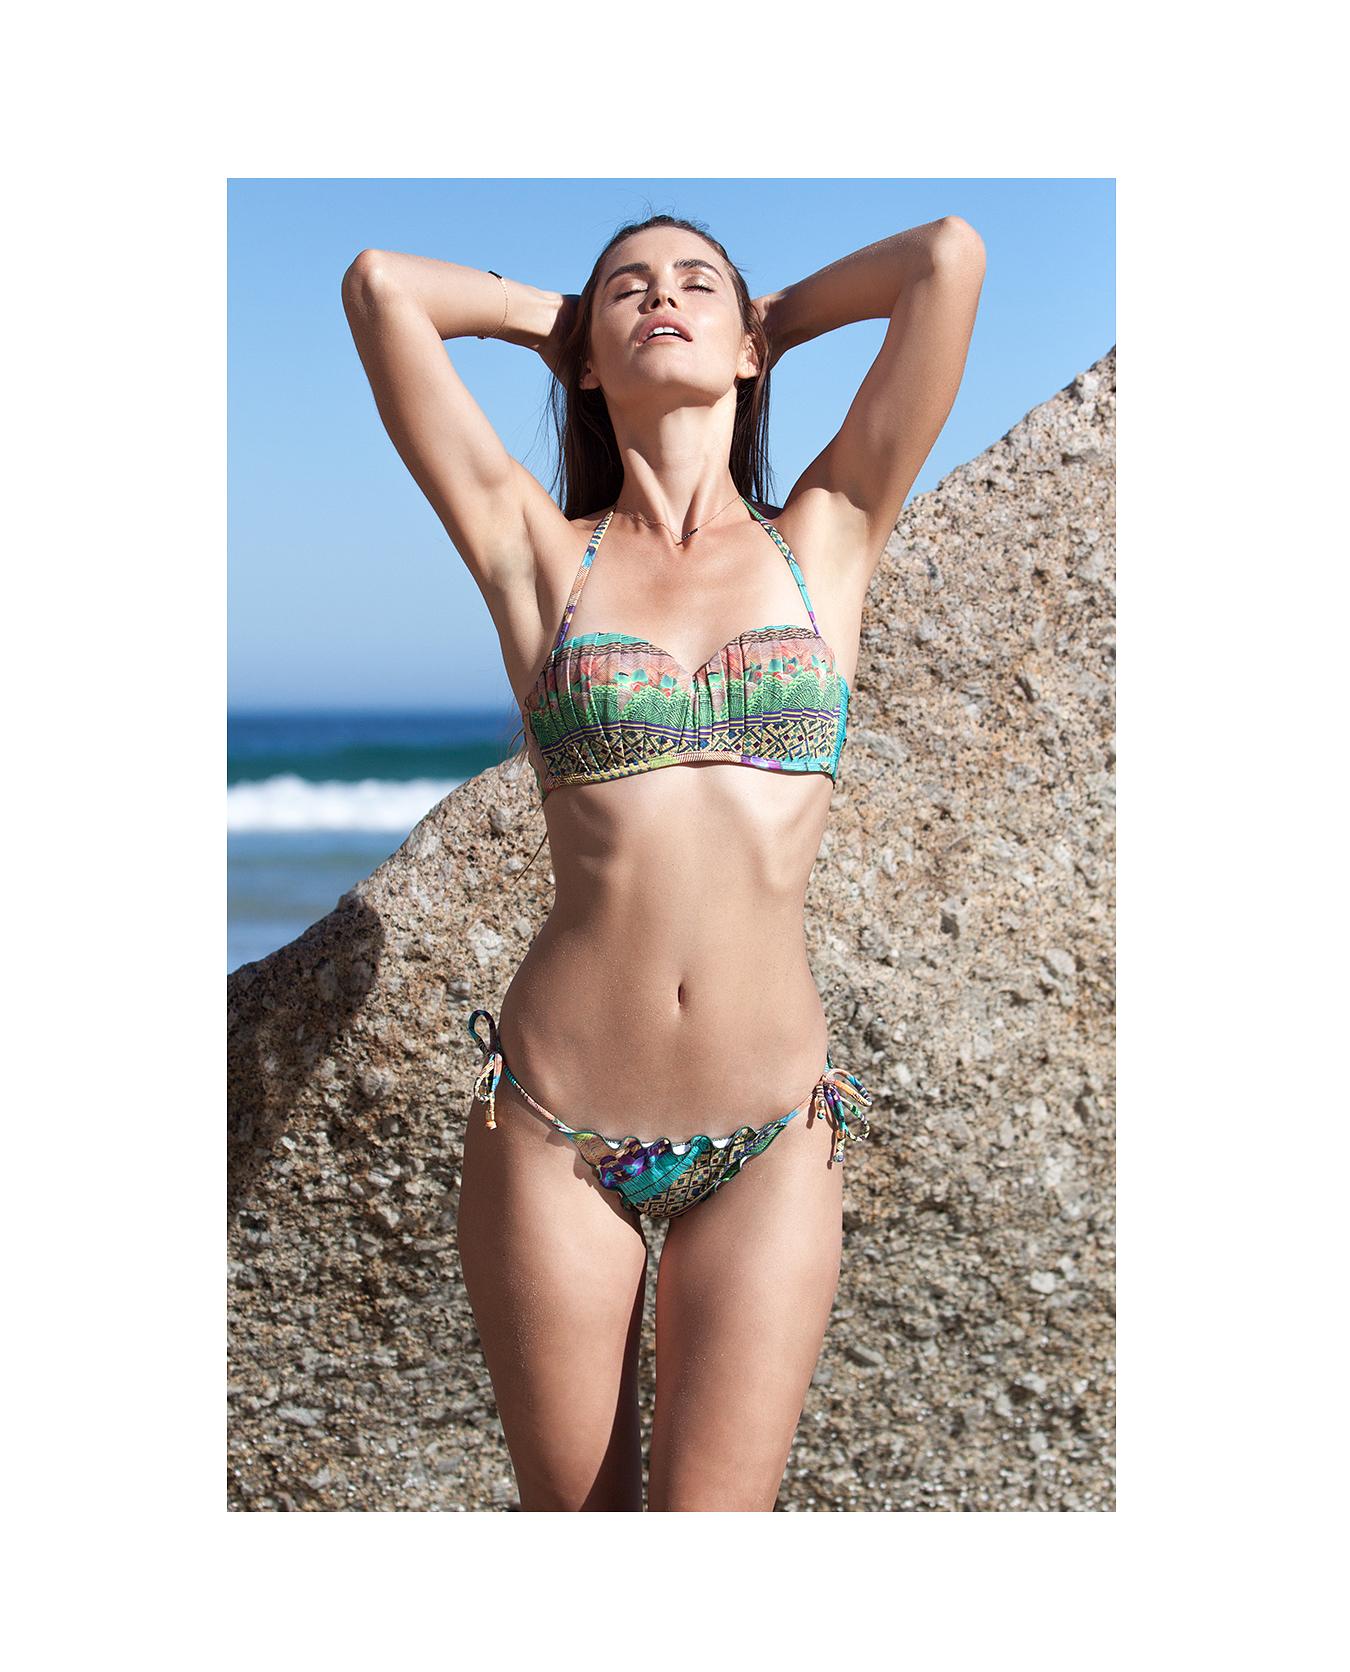 Hot Marike Wessels nude (82 foto and video), Ass, Leaked, Twitter, in bikini 2020